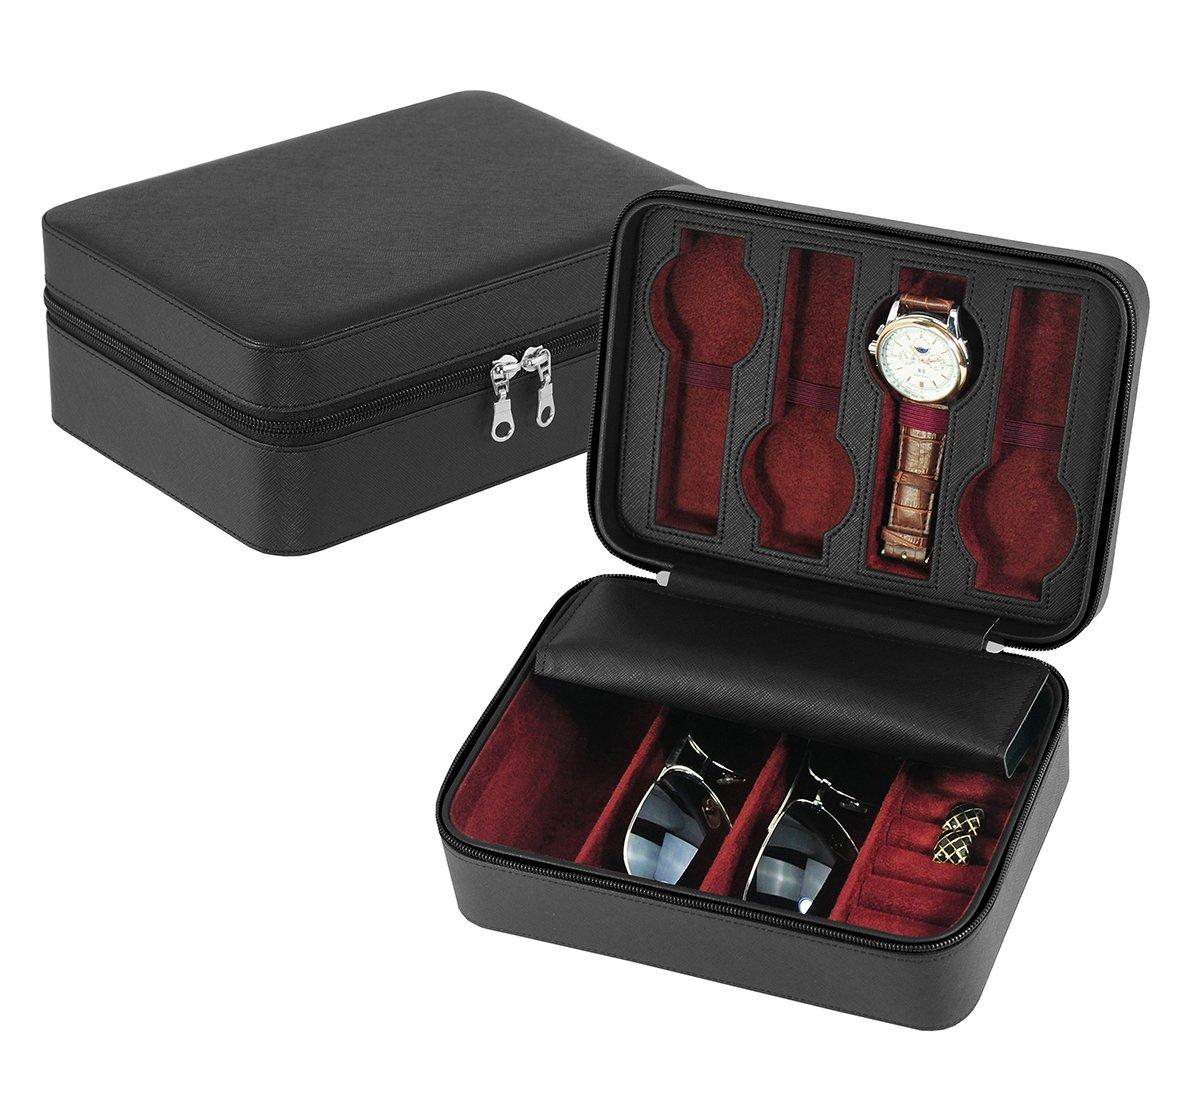 01f5d96b7366c DecoreBay Unisex Watch, sunglasses,Cufflink Case & Ring Storage Organizer  Jewelry Box Gift (Love Life)